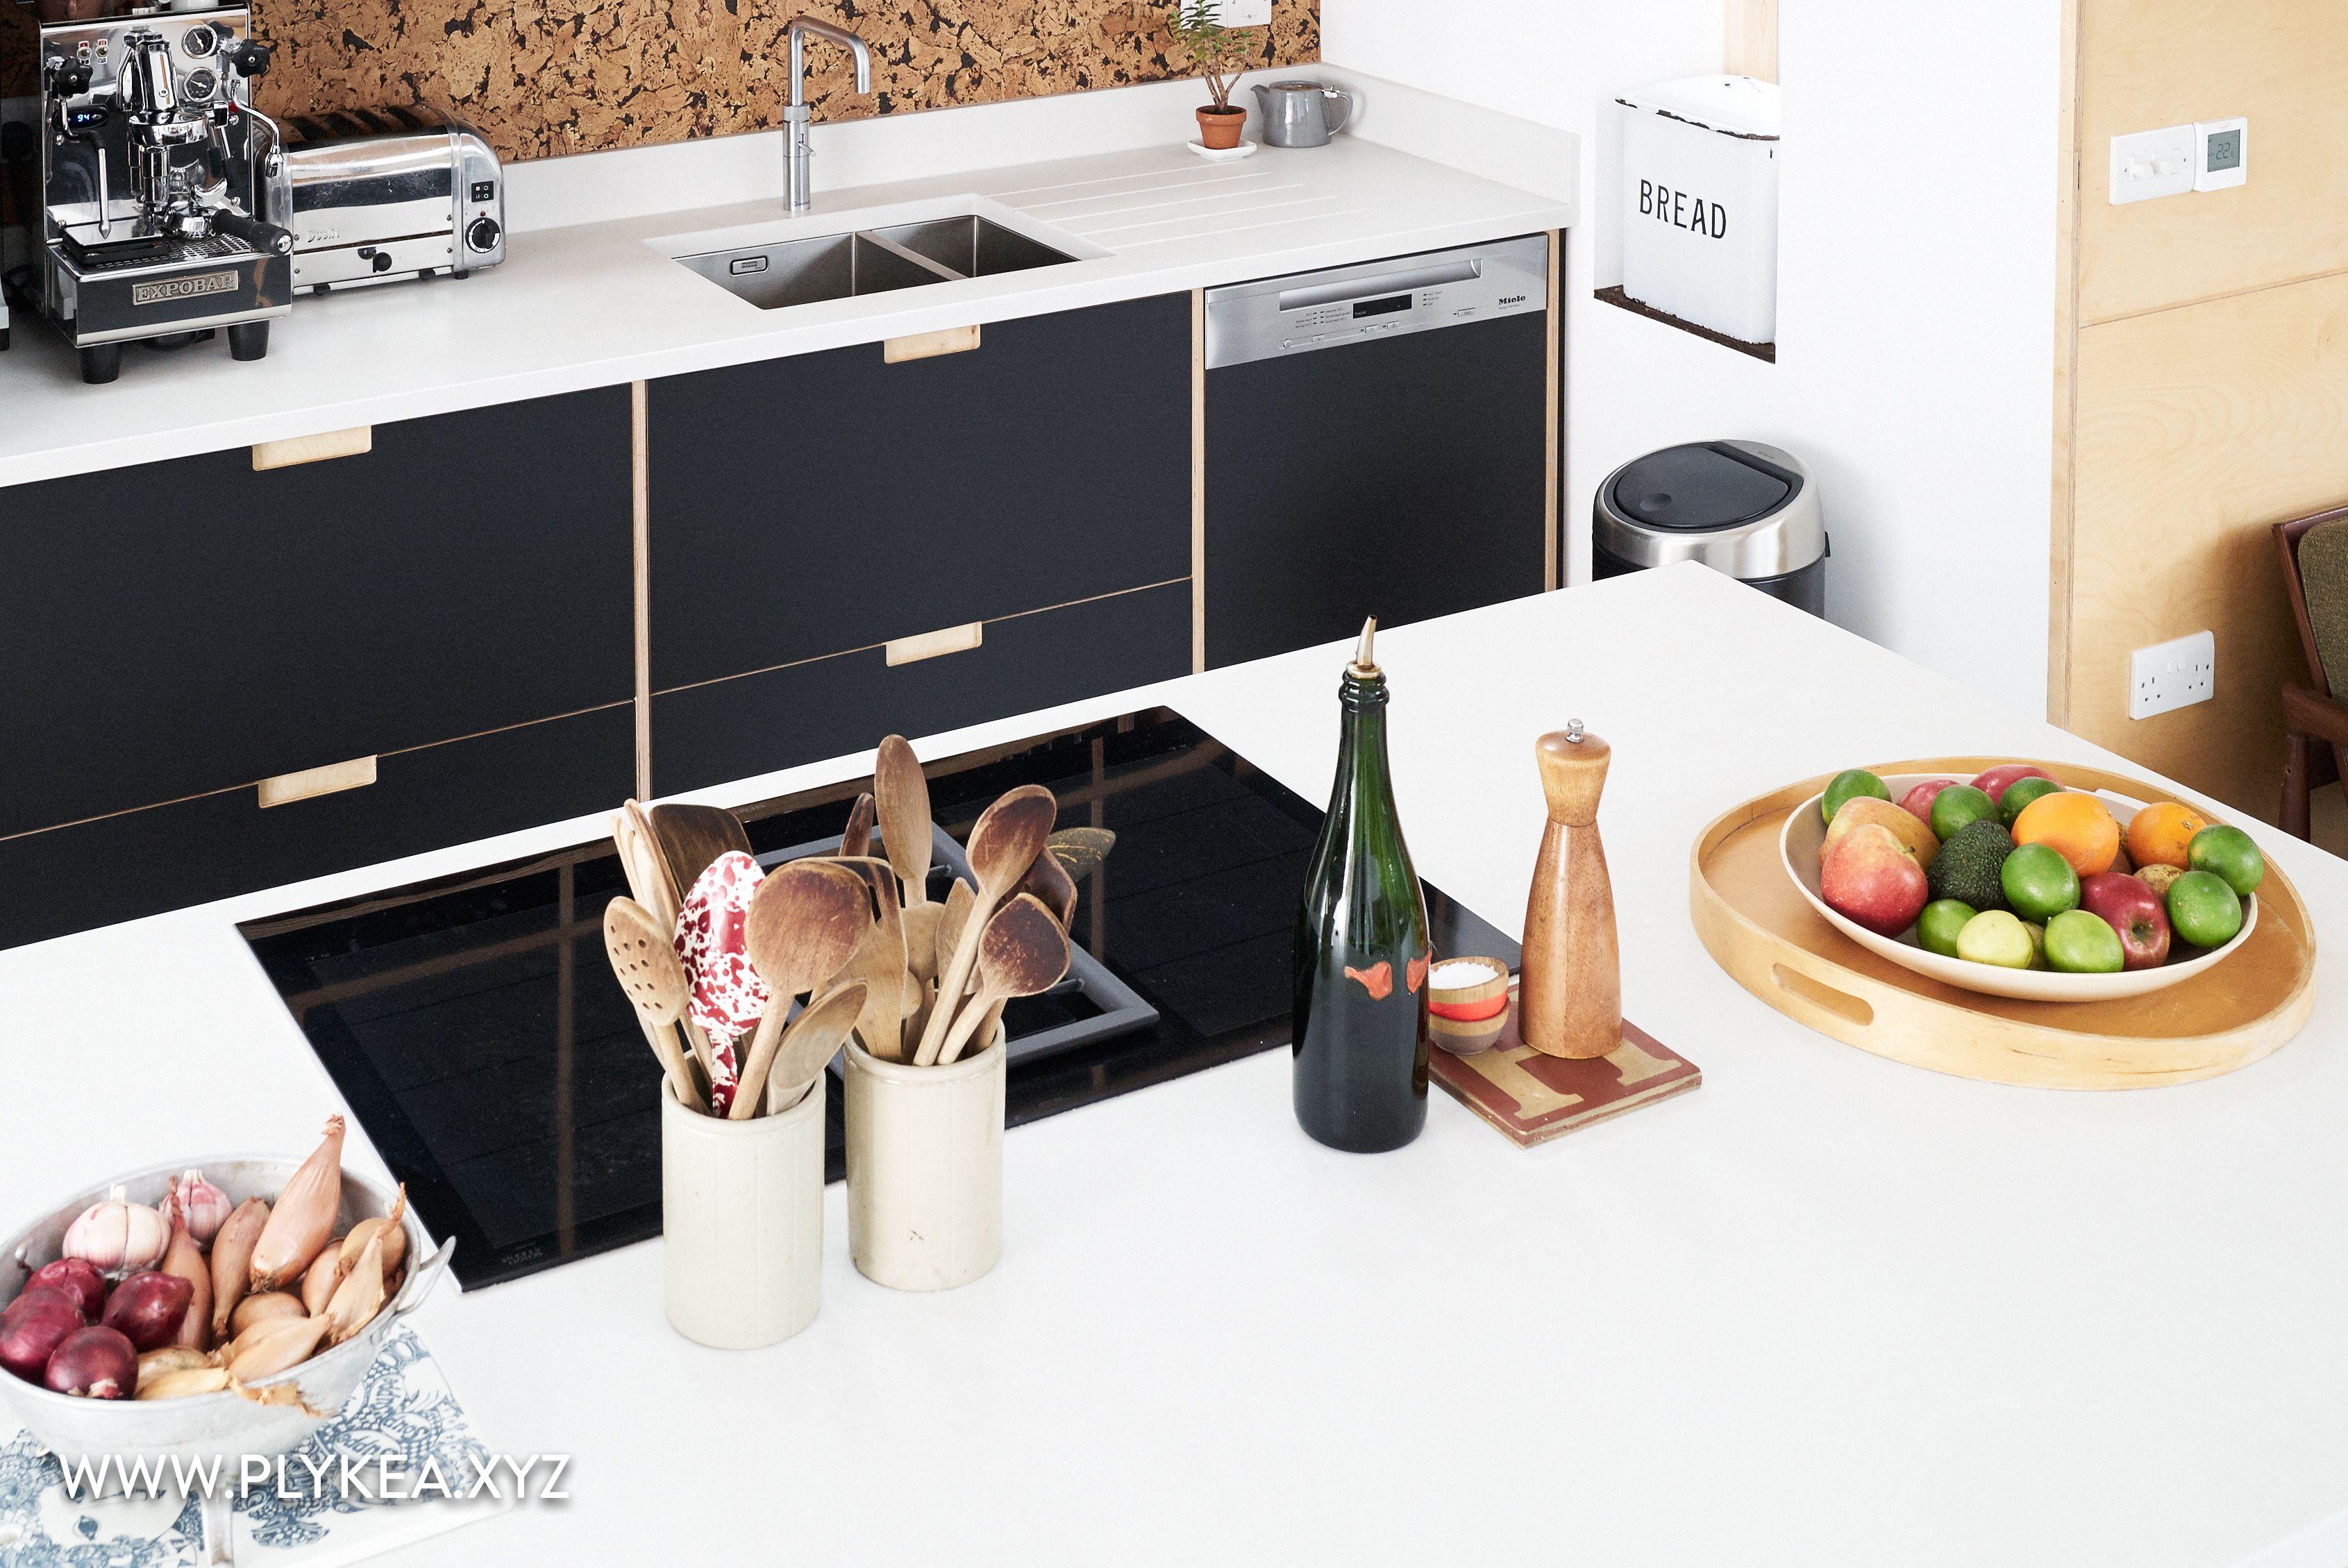 whiterock rd 04 Fenix faced plywood kitchen using IKEA